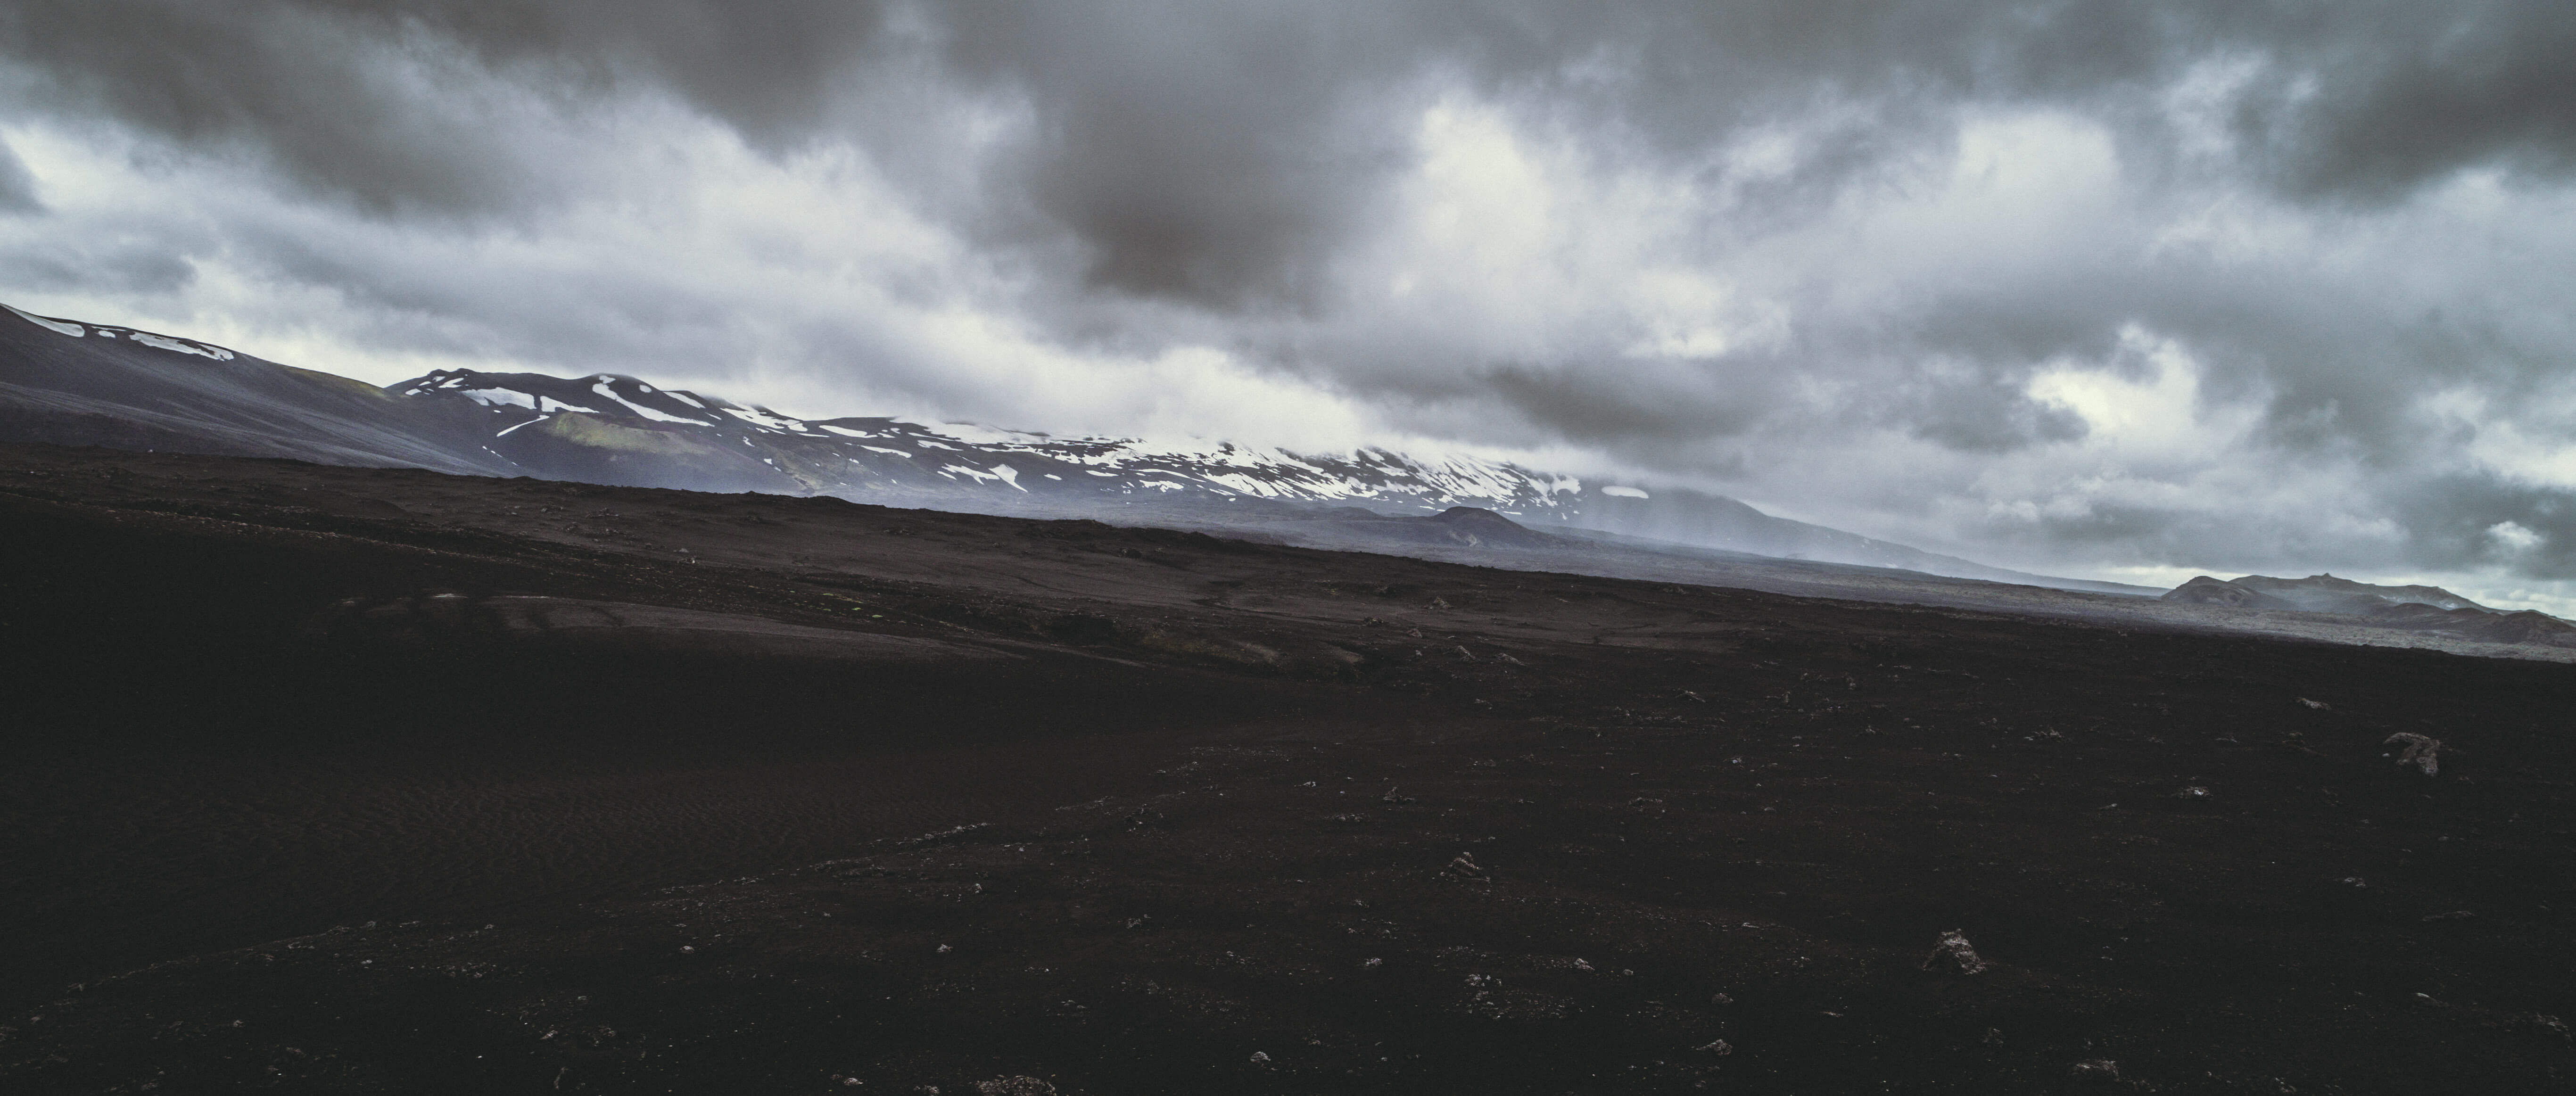 Nissan_Islande-40